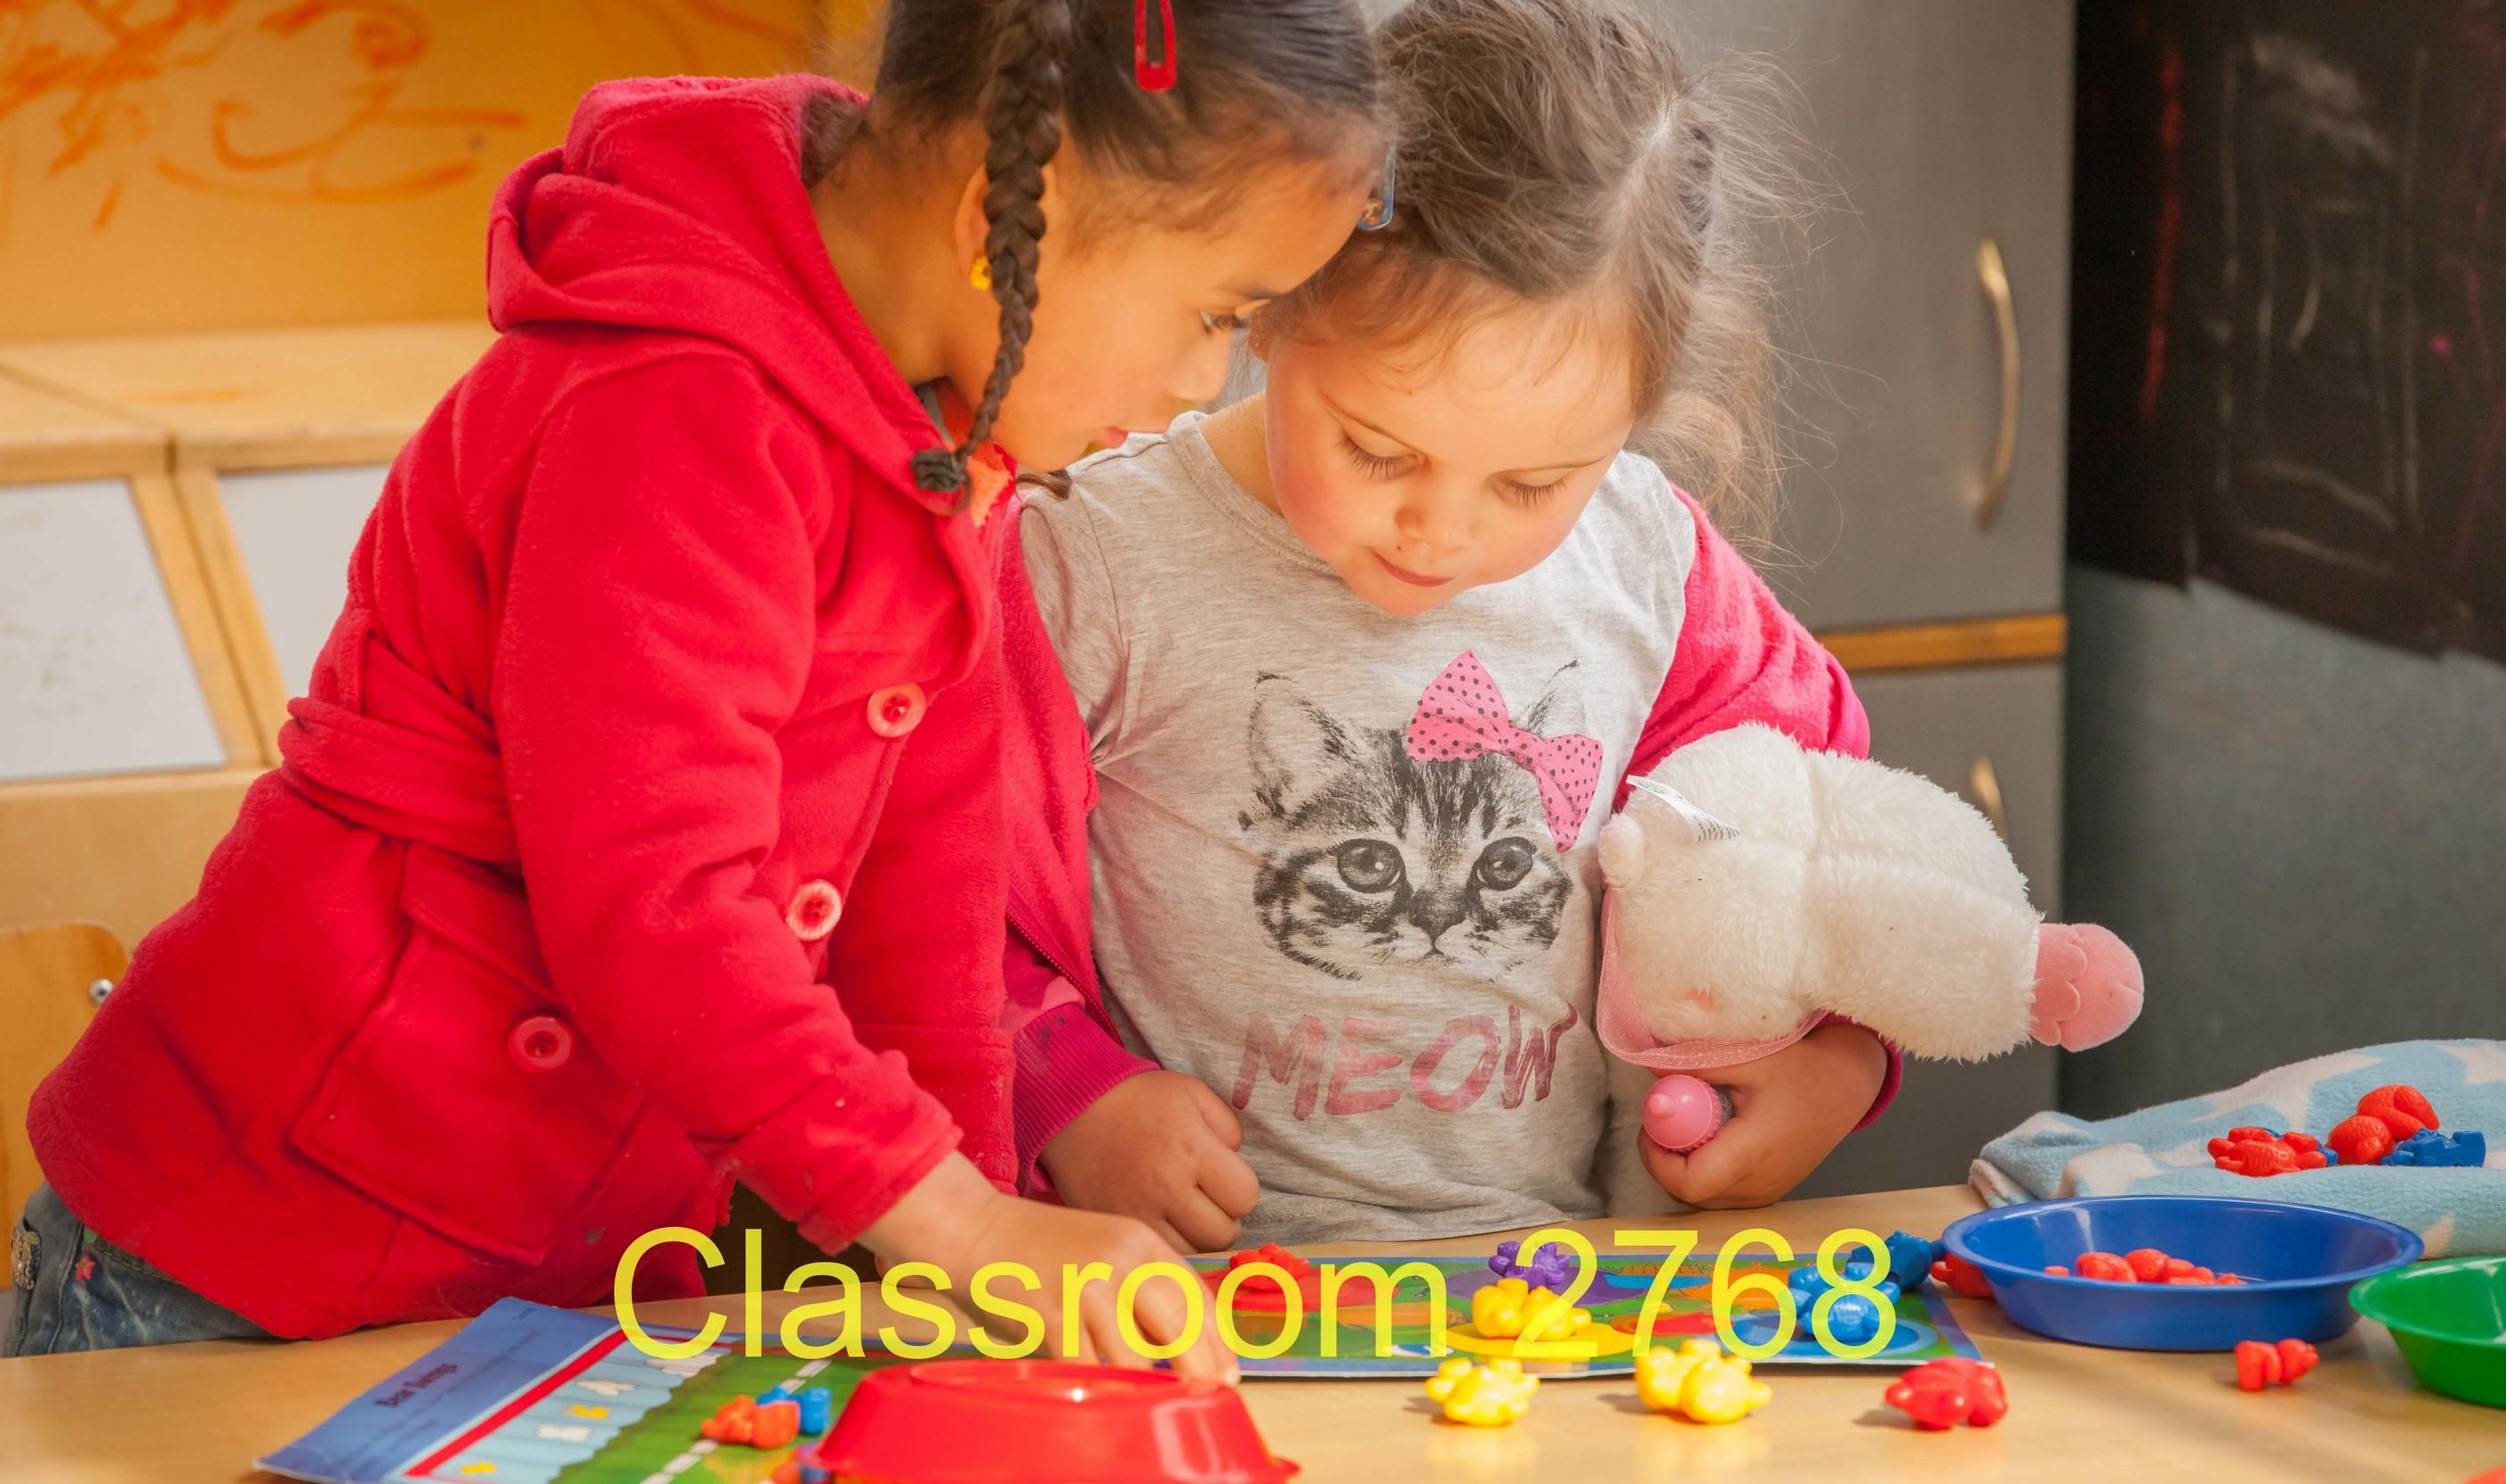 Classroom 2768